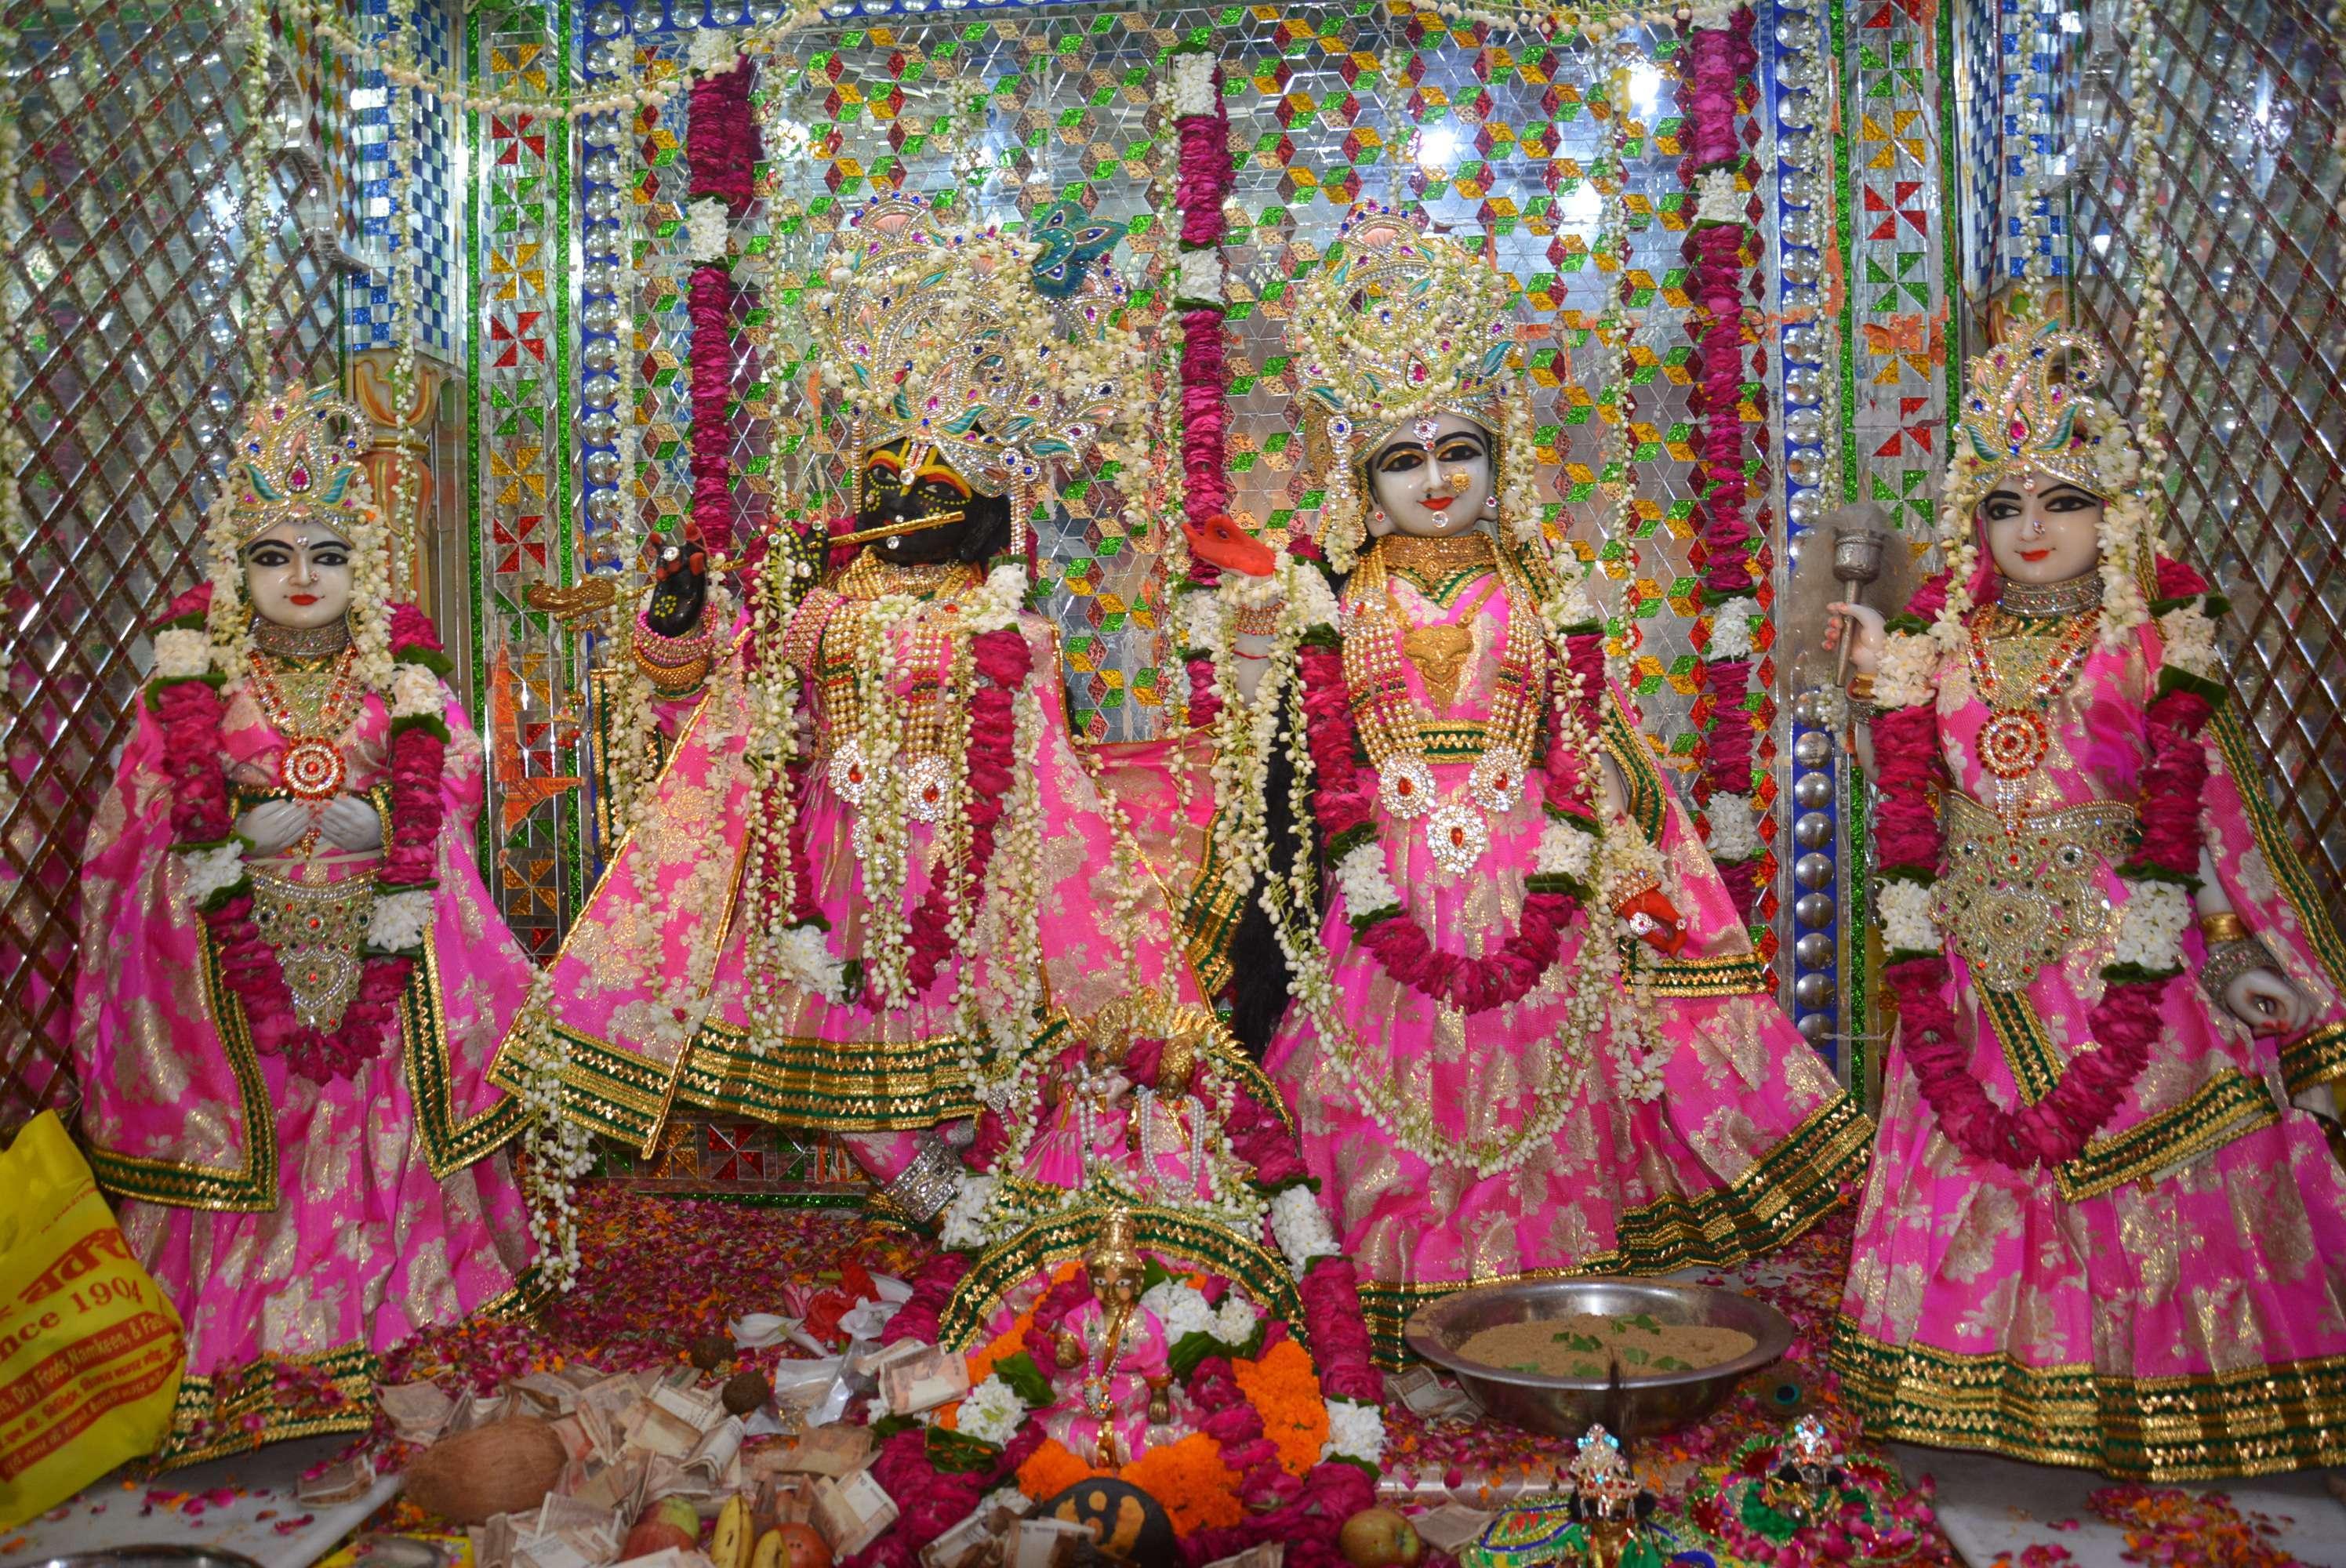 janmashtmi celebration 2019 in alwar